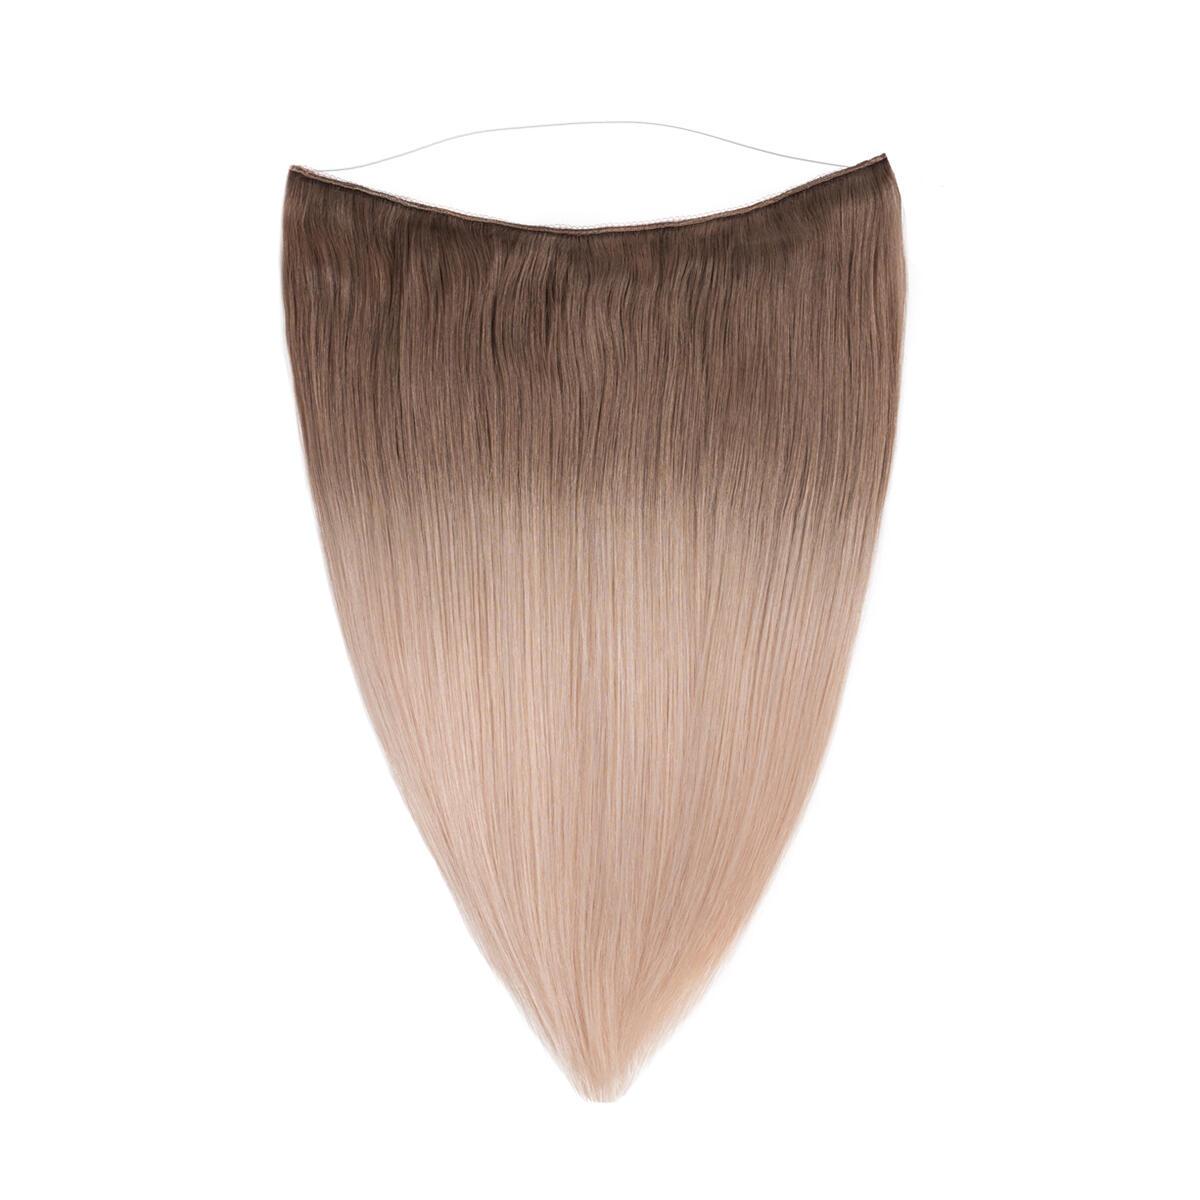 Hairband Original O7.3/10.8 Cendre Ash Blond Ombre 45 cm